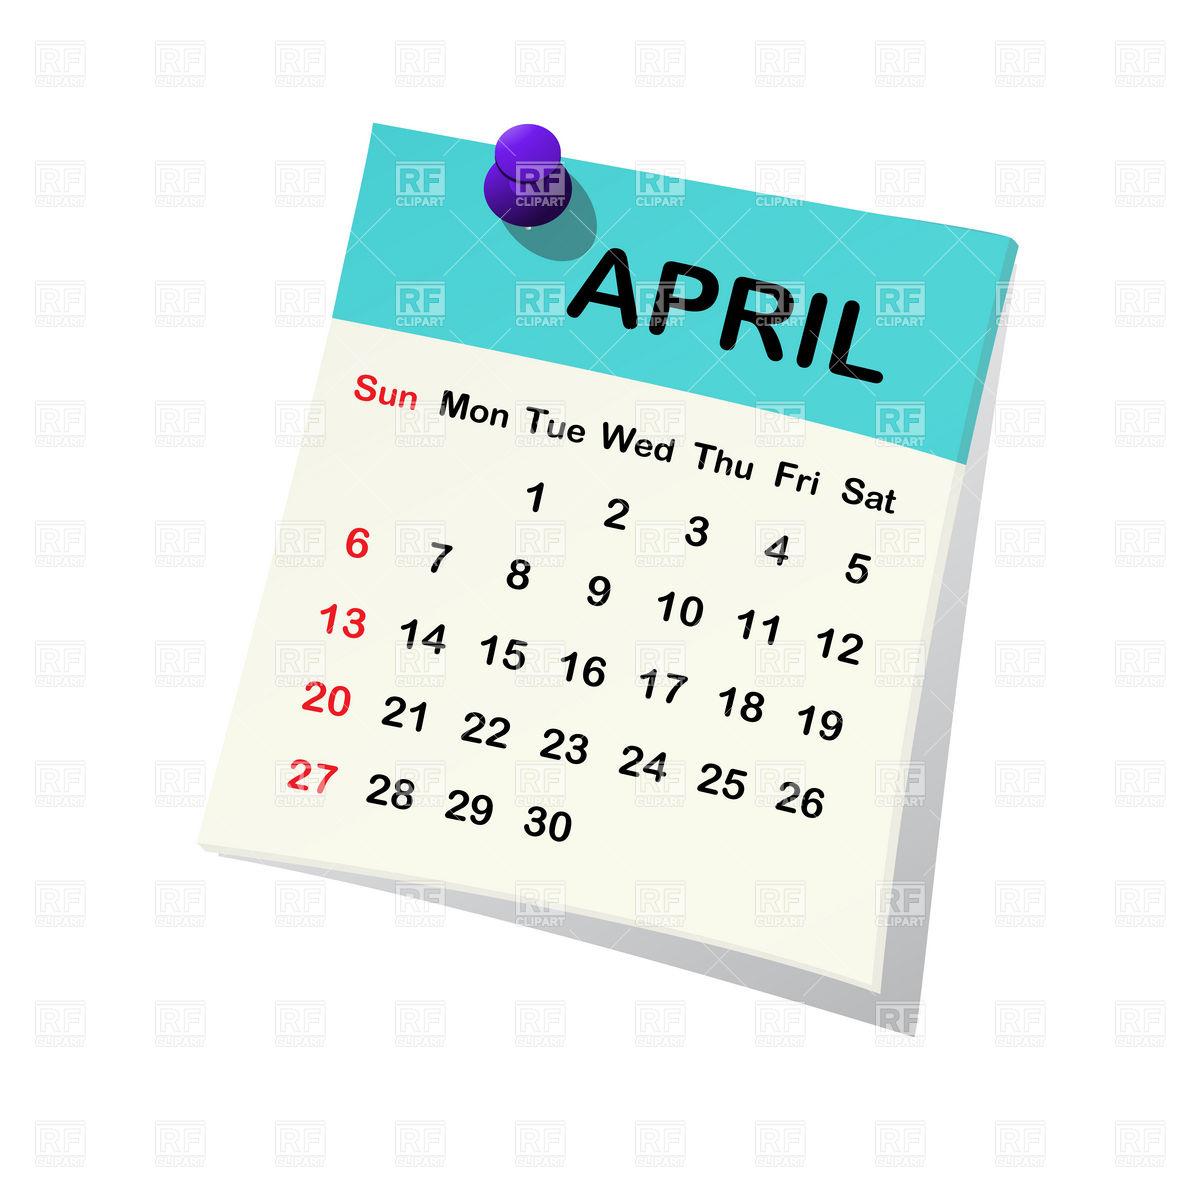 April 2015 calendar clipart clipart transparent stock Index of /wp-content/uploads/2015/03 clipart transparent stock